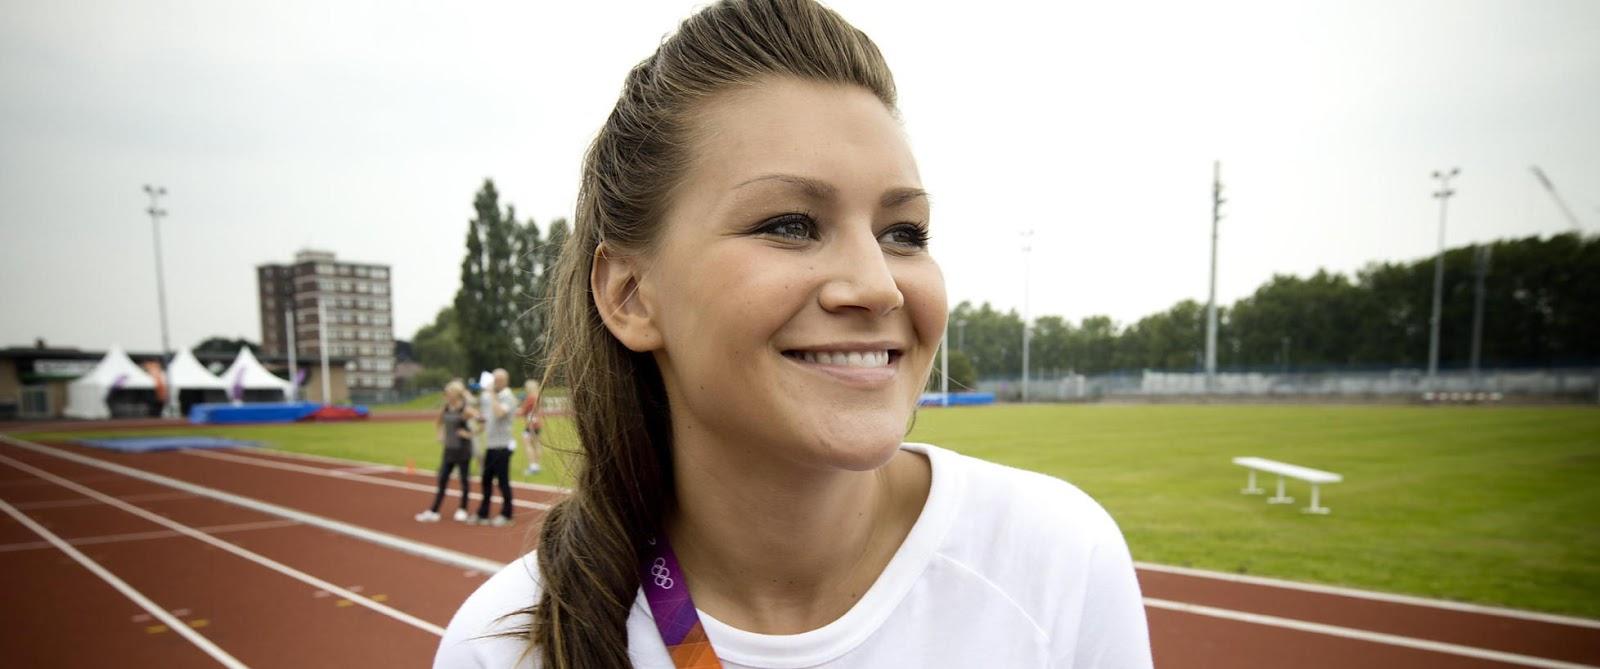 Hot Women In Sport: Amanda Kurtovic